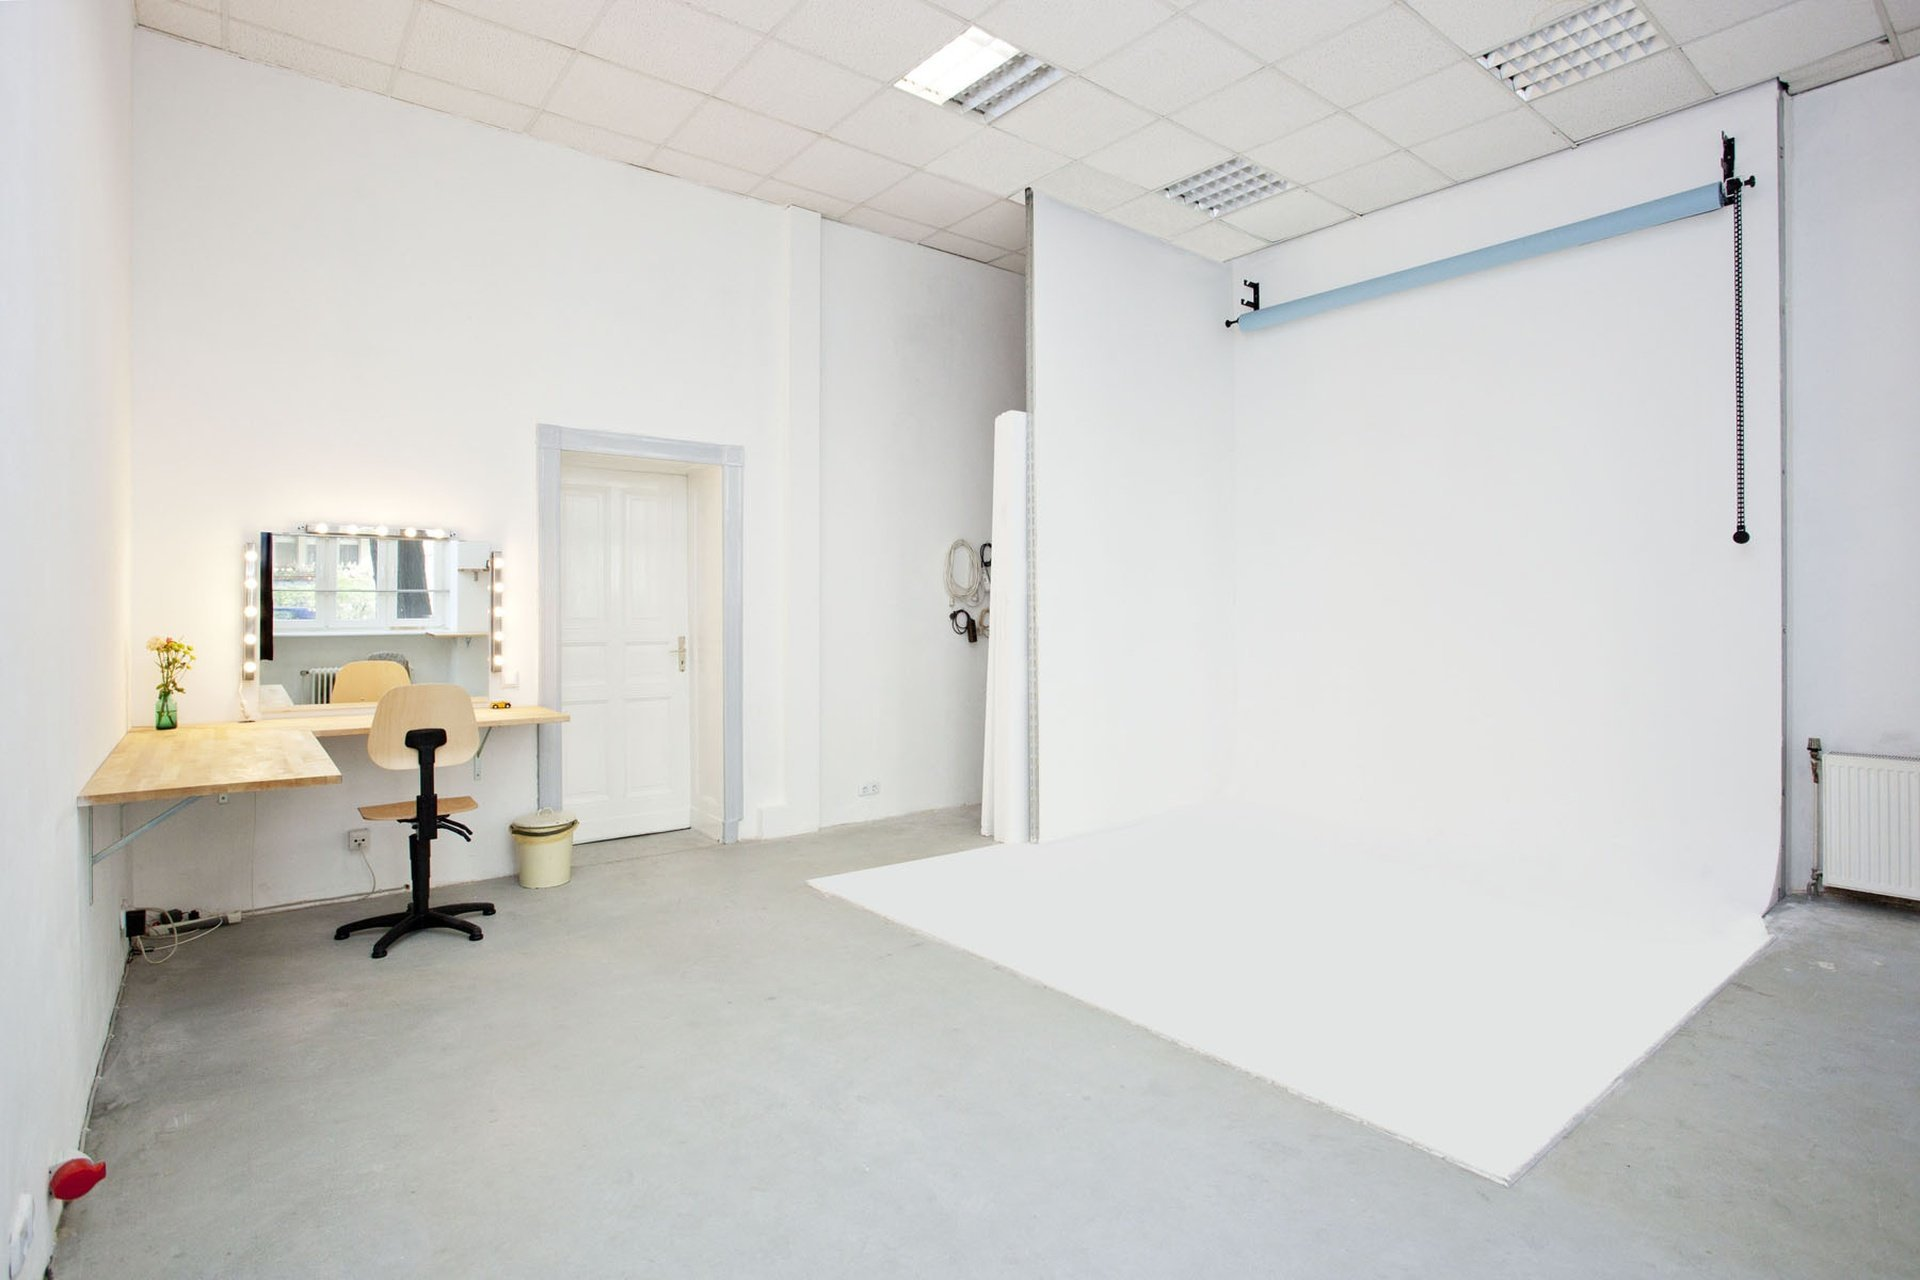 Berlin workshop spaces Foto Studio Blender & Co. - Photostudio image 0